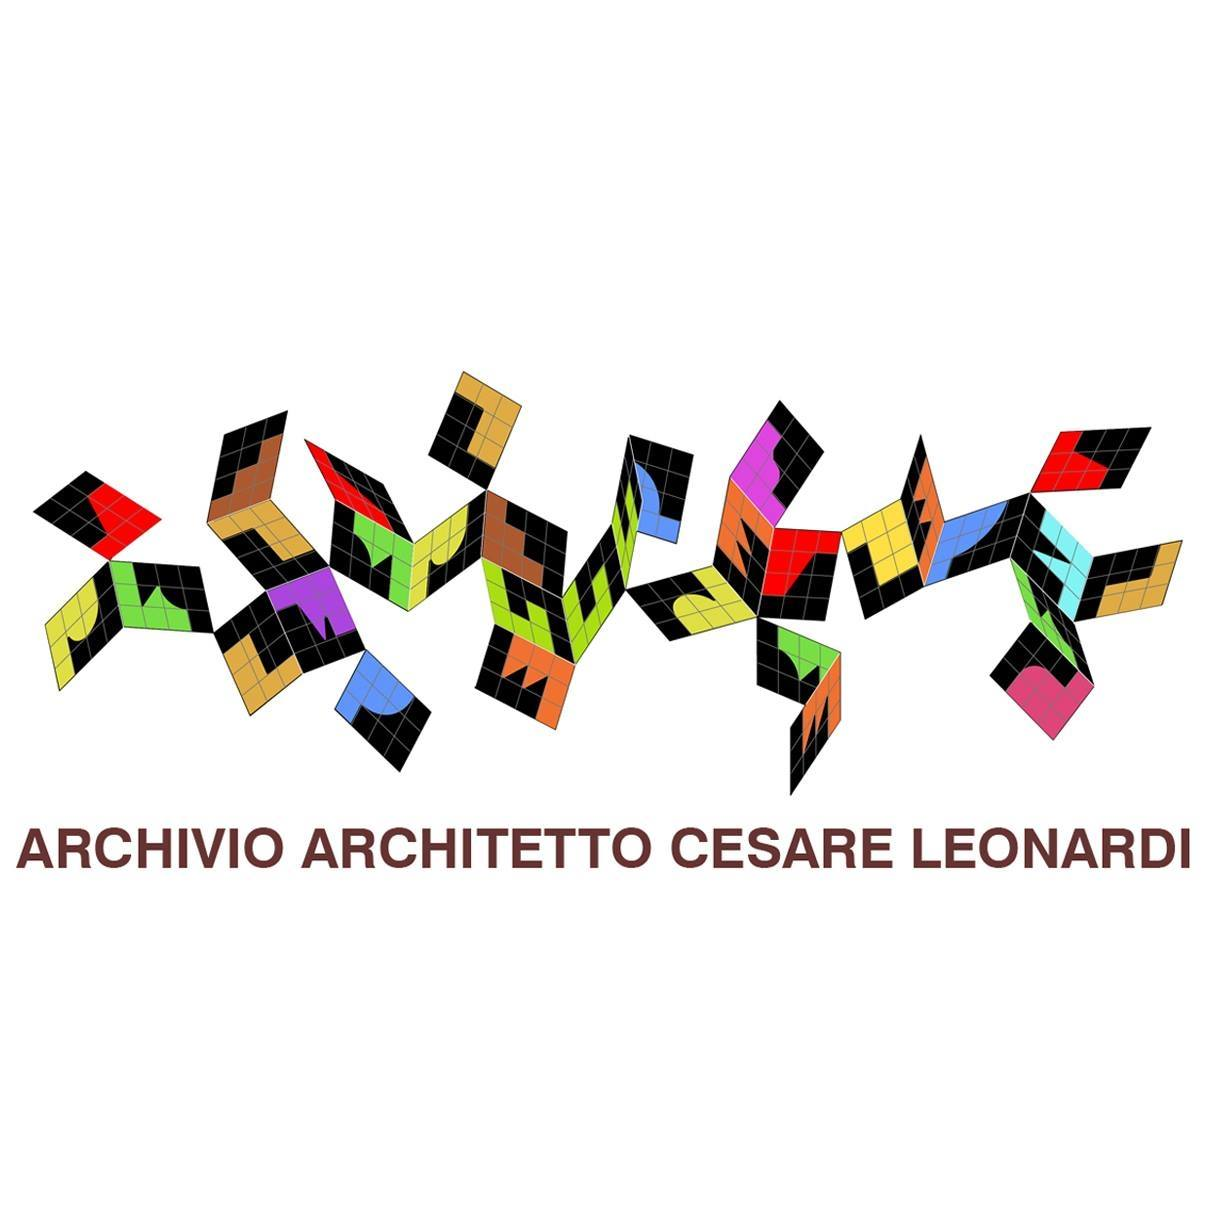 Archivio Architetto Cesare Leonardi